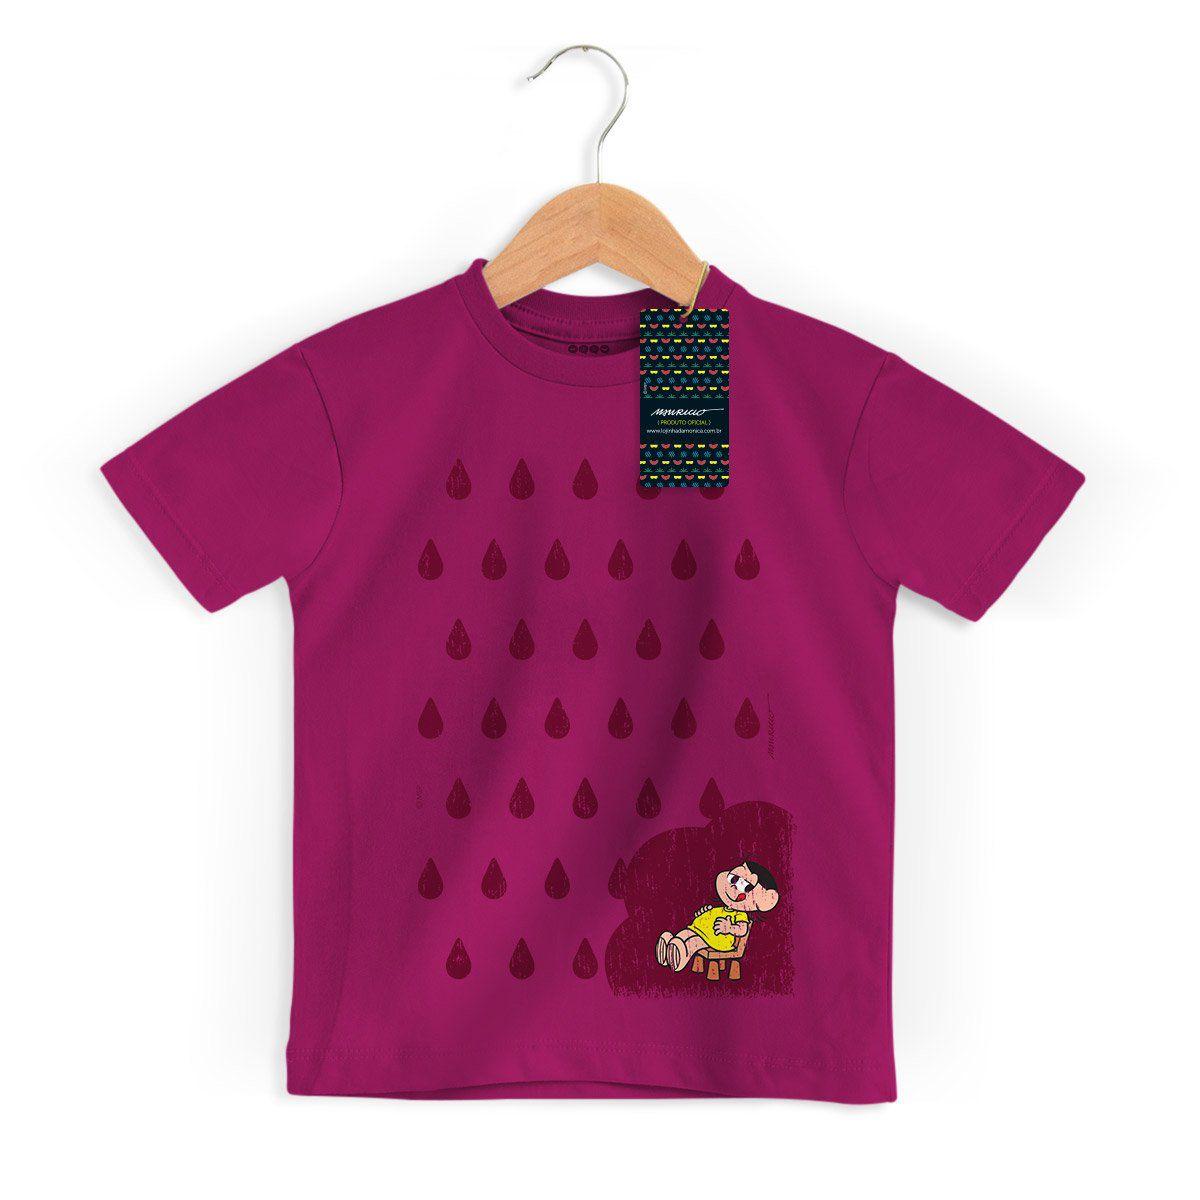 Camiseta Infantil Turma da Mônica Cool Magali Sementes